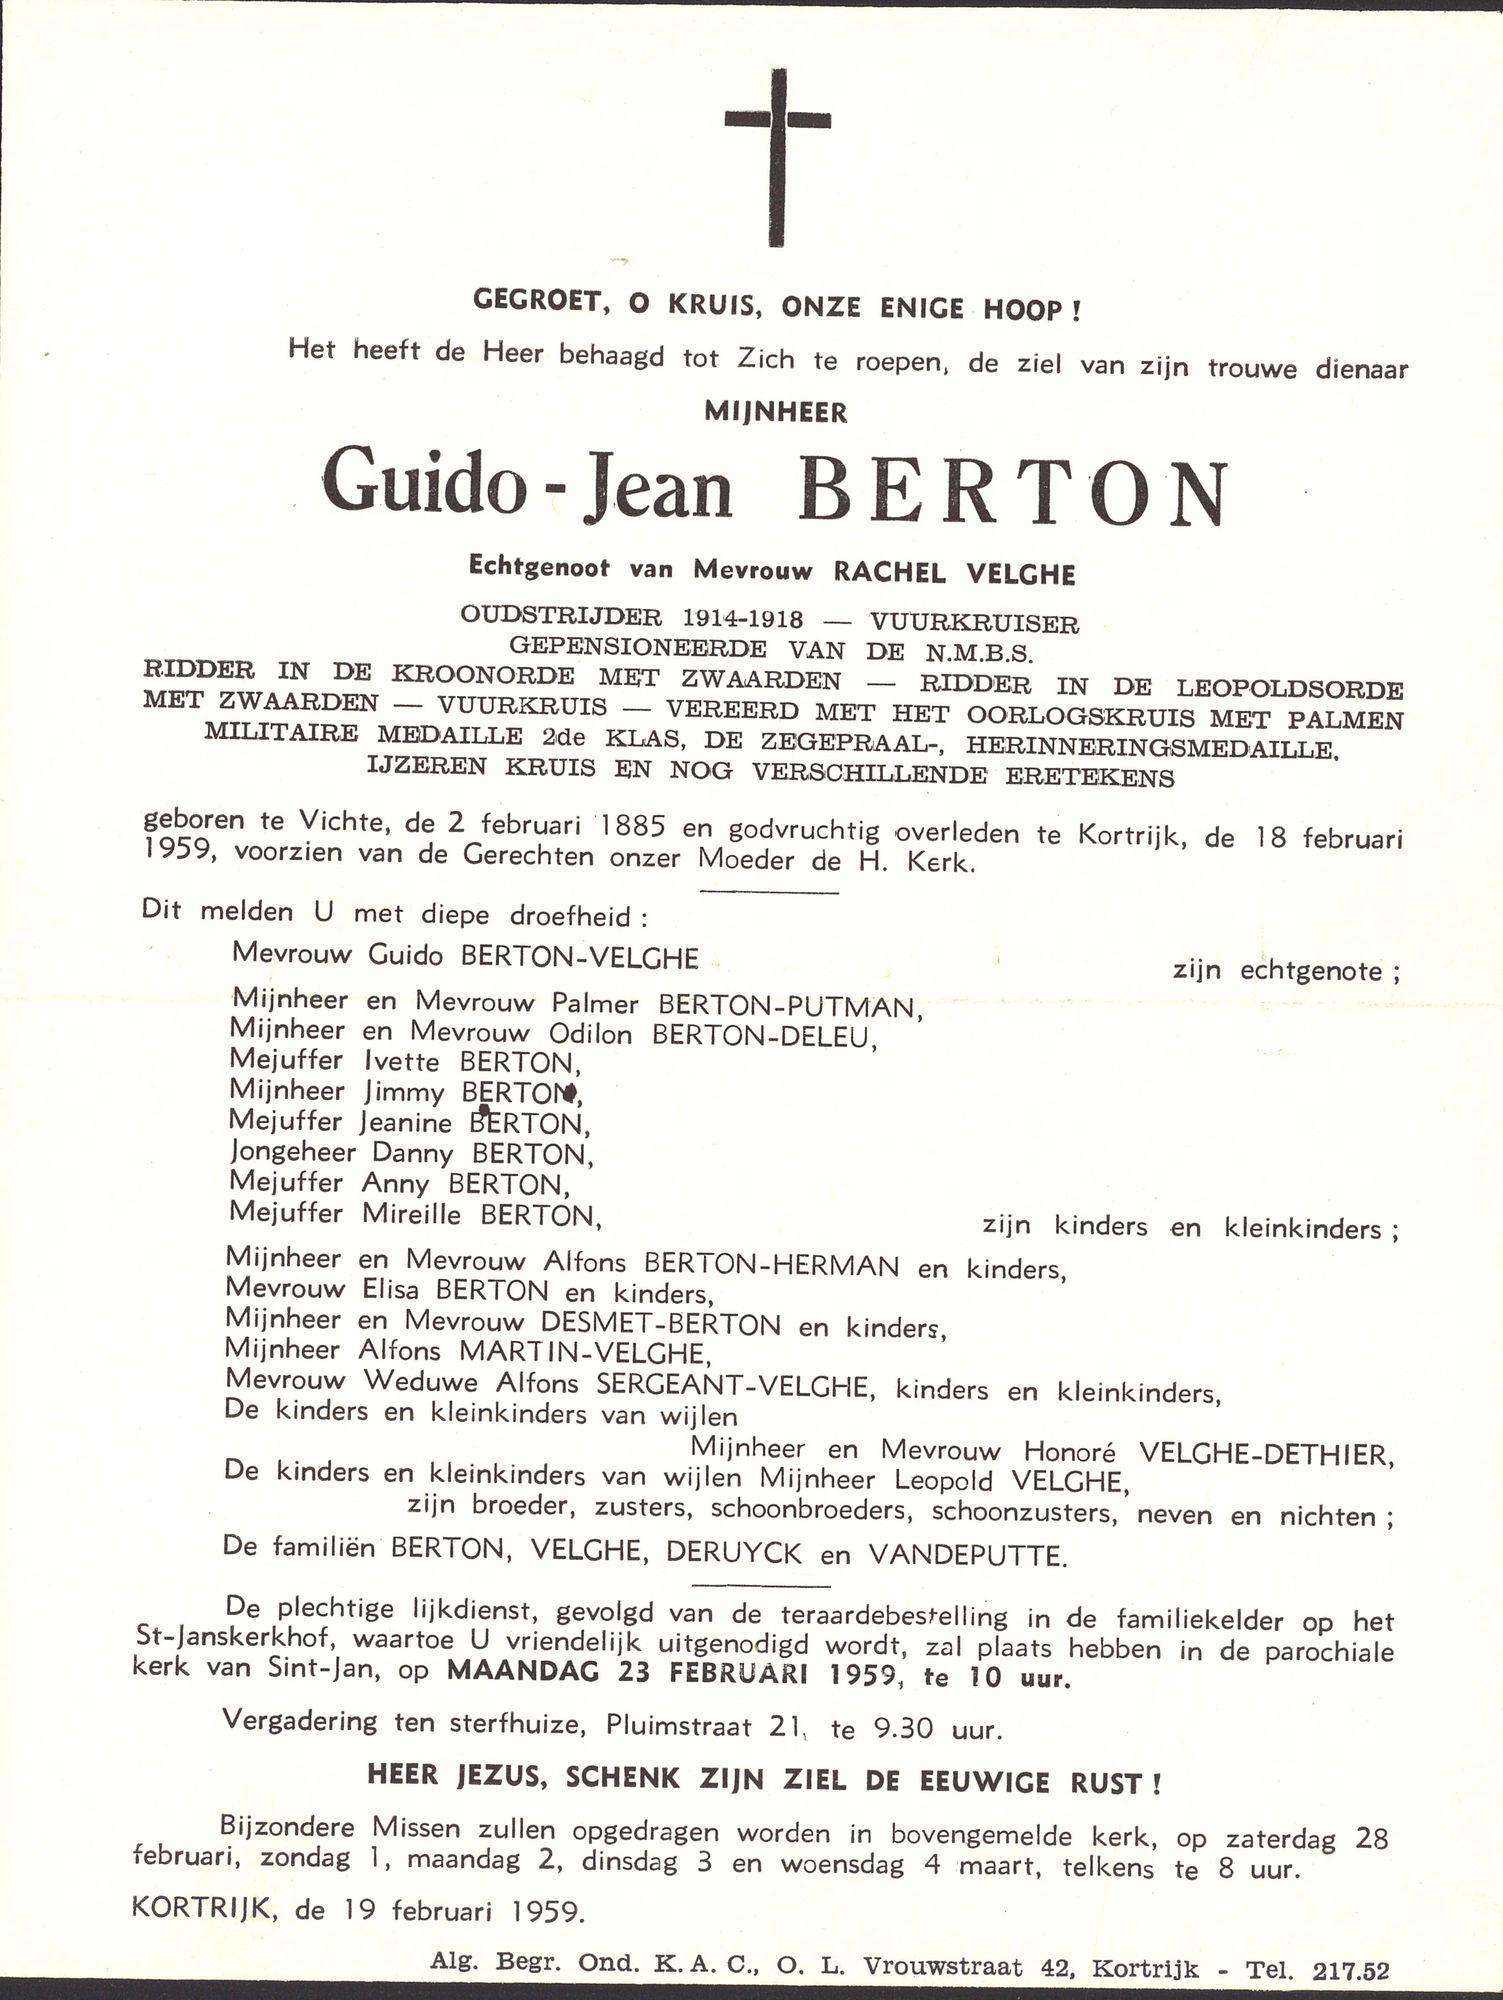 Berton Guido-Jean